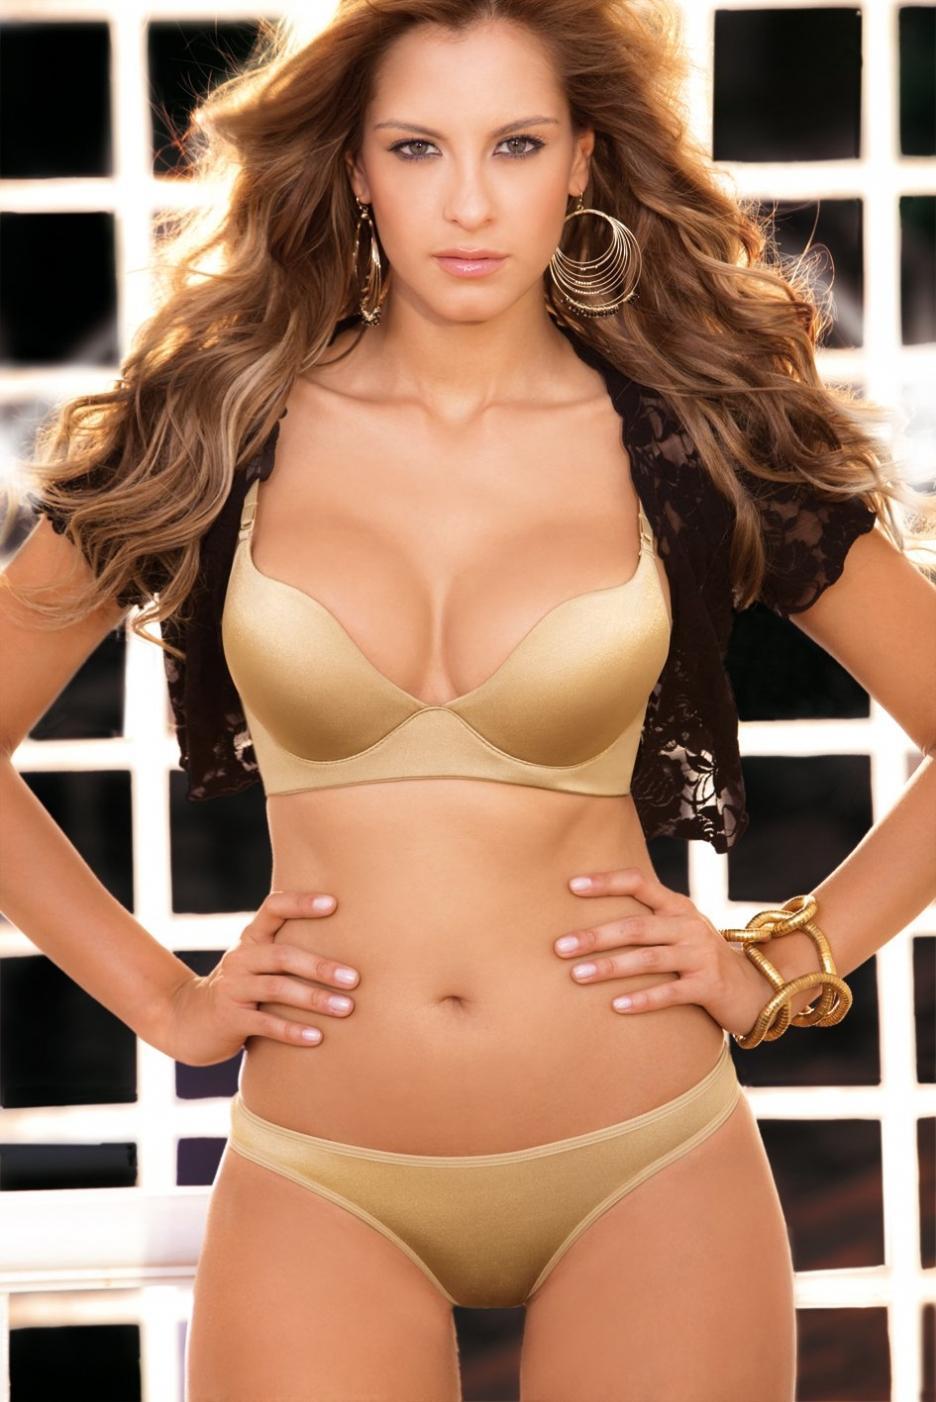 Laura Acuña in lingerie